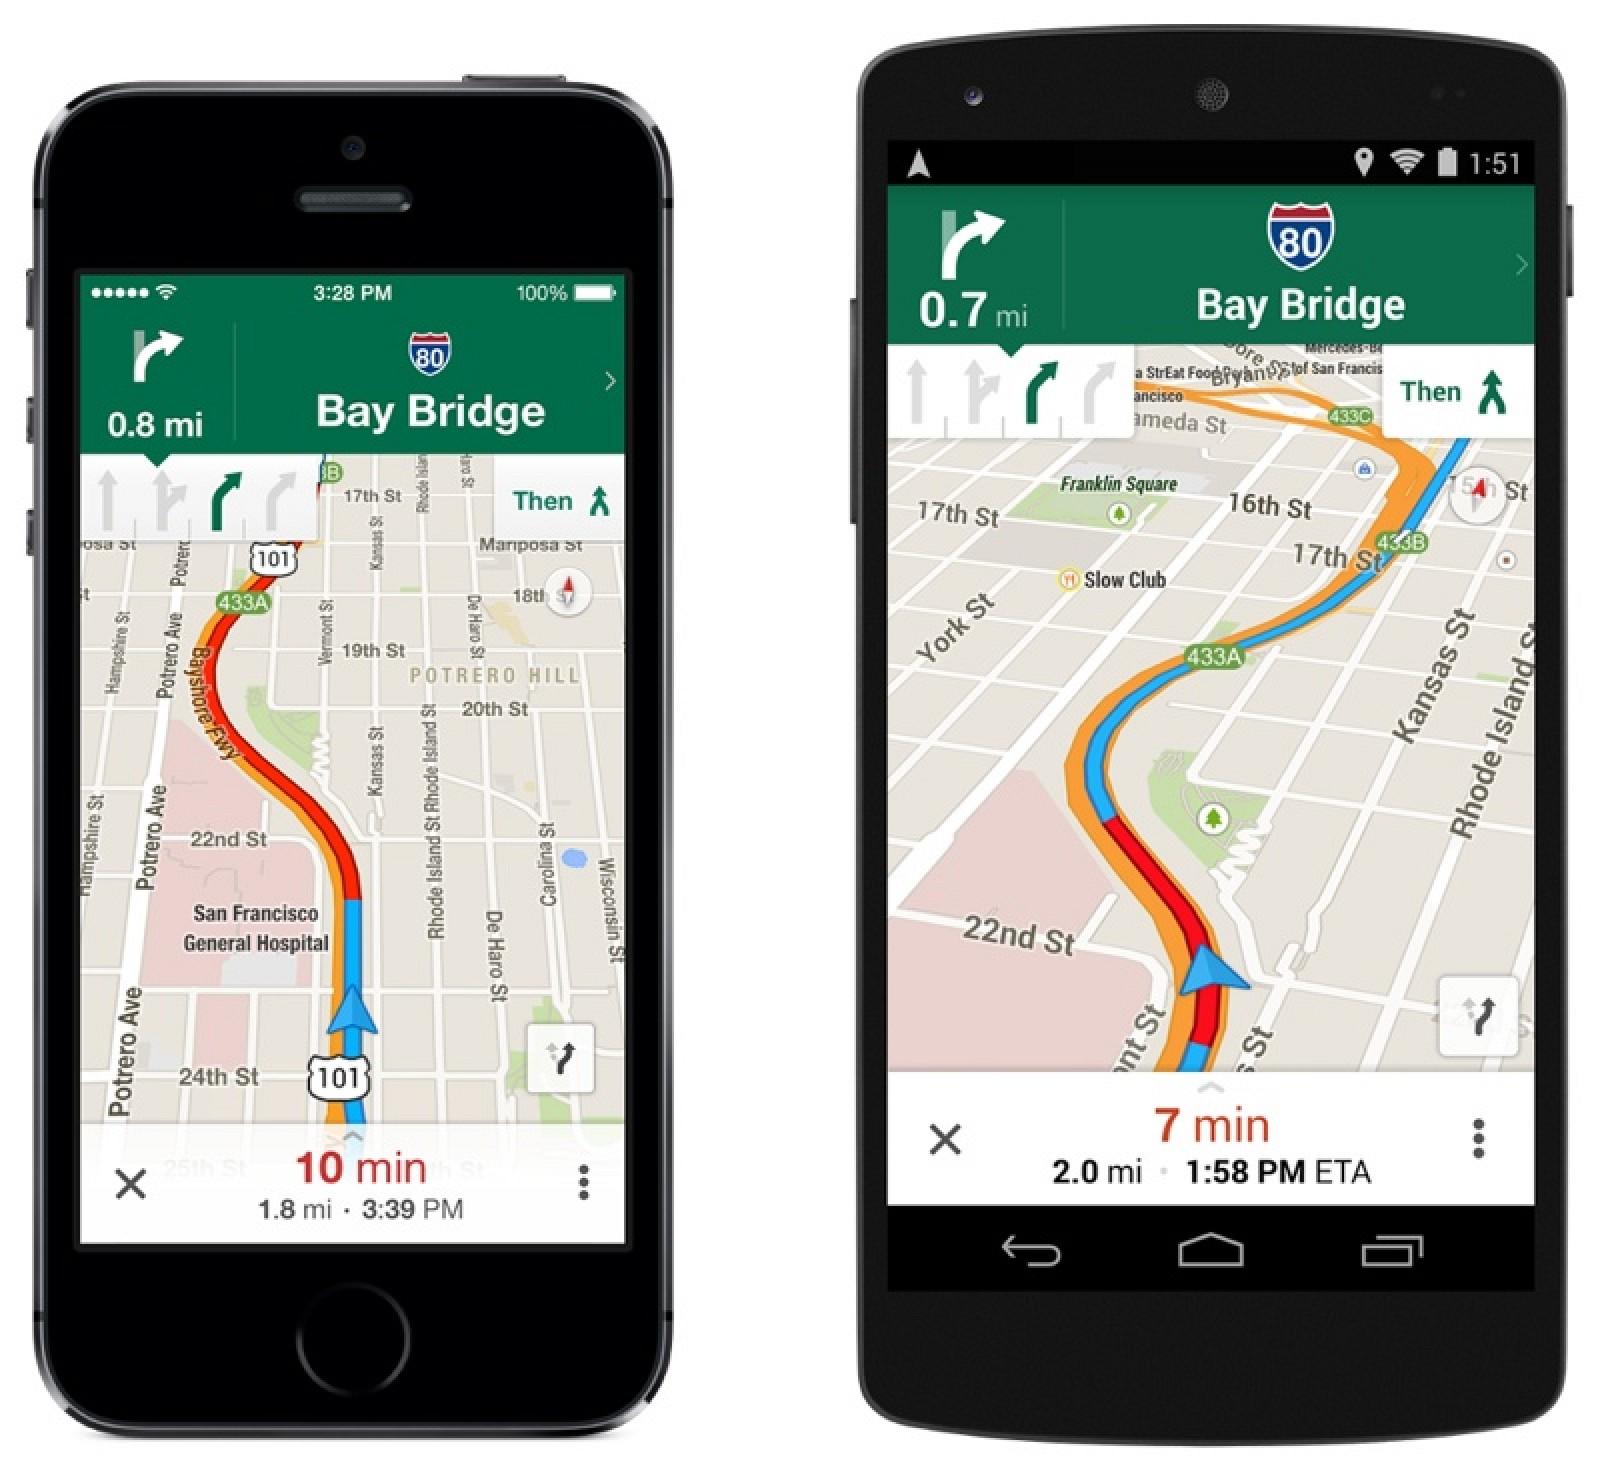 Google Maps For Ios Gains Uber Integration Lane Guidance